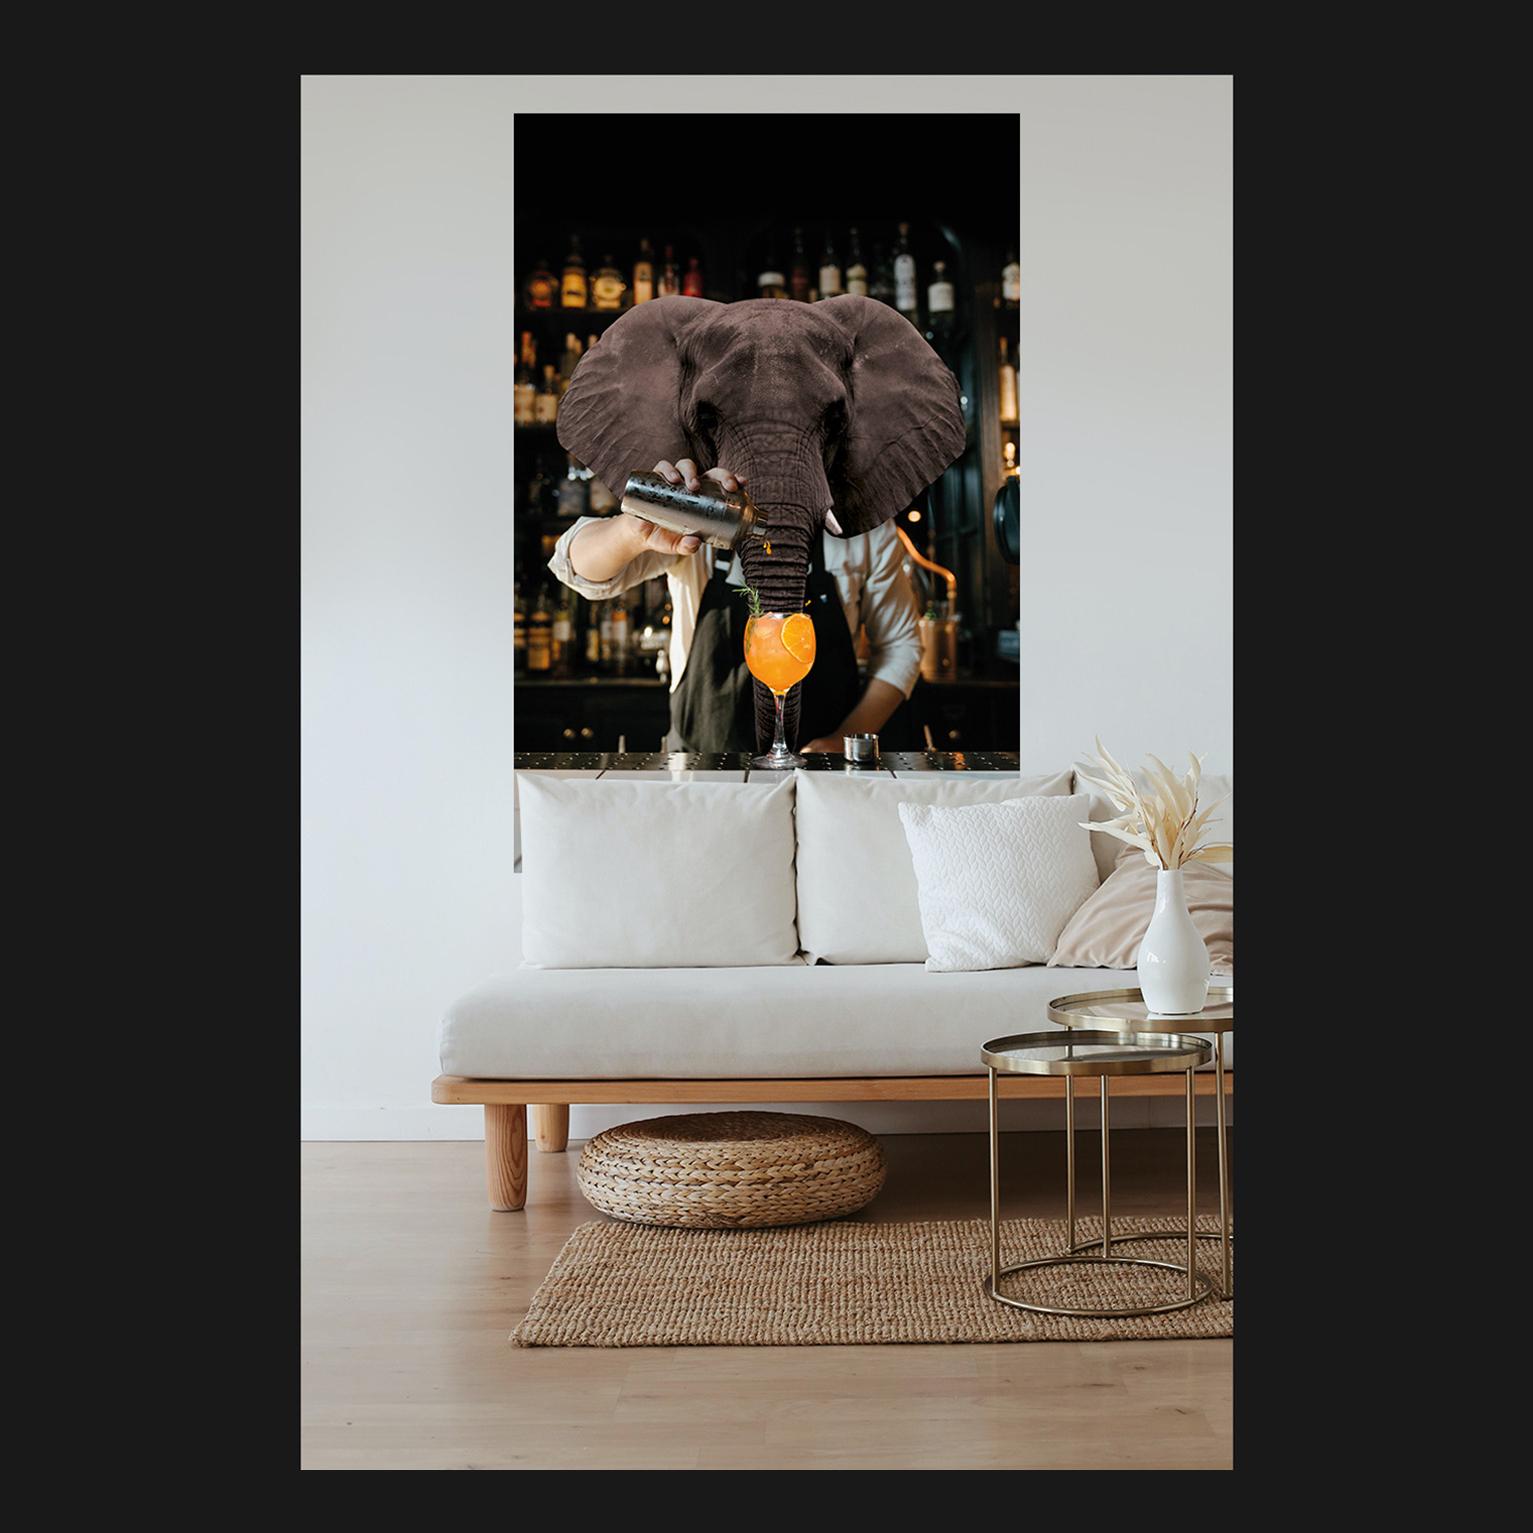 Drunk Elephant   Walldsigns